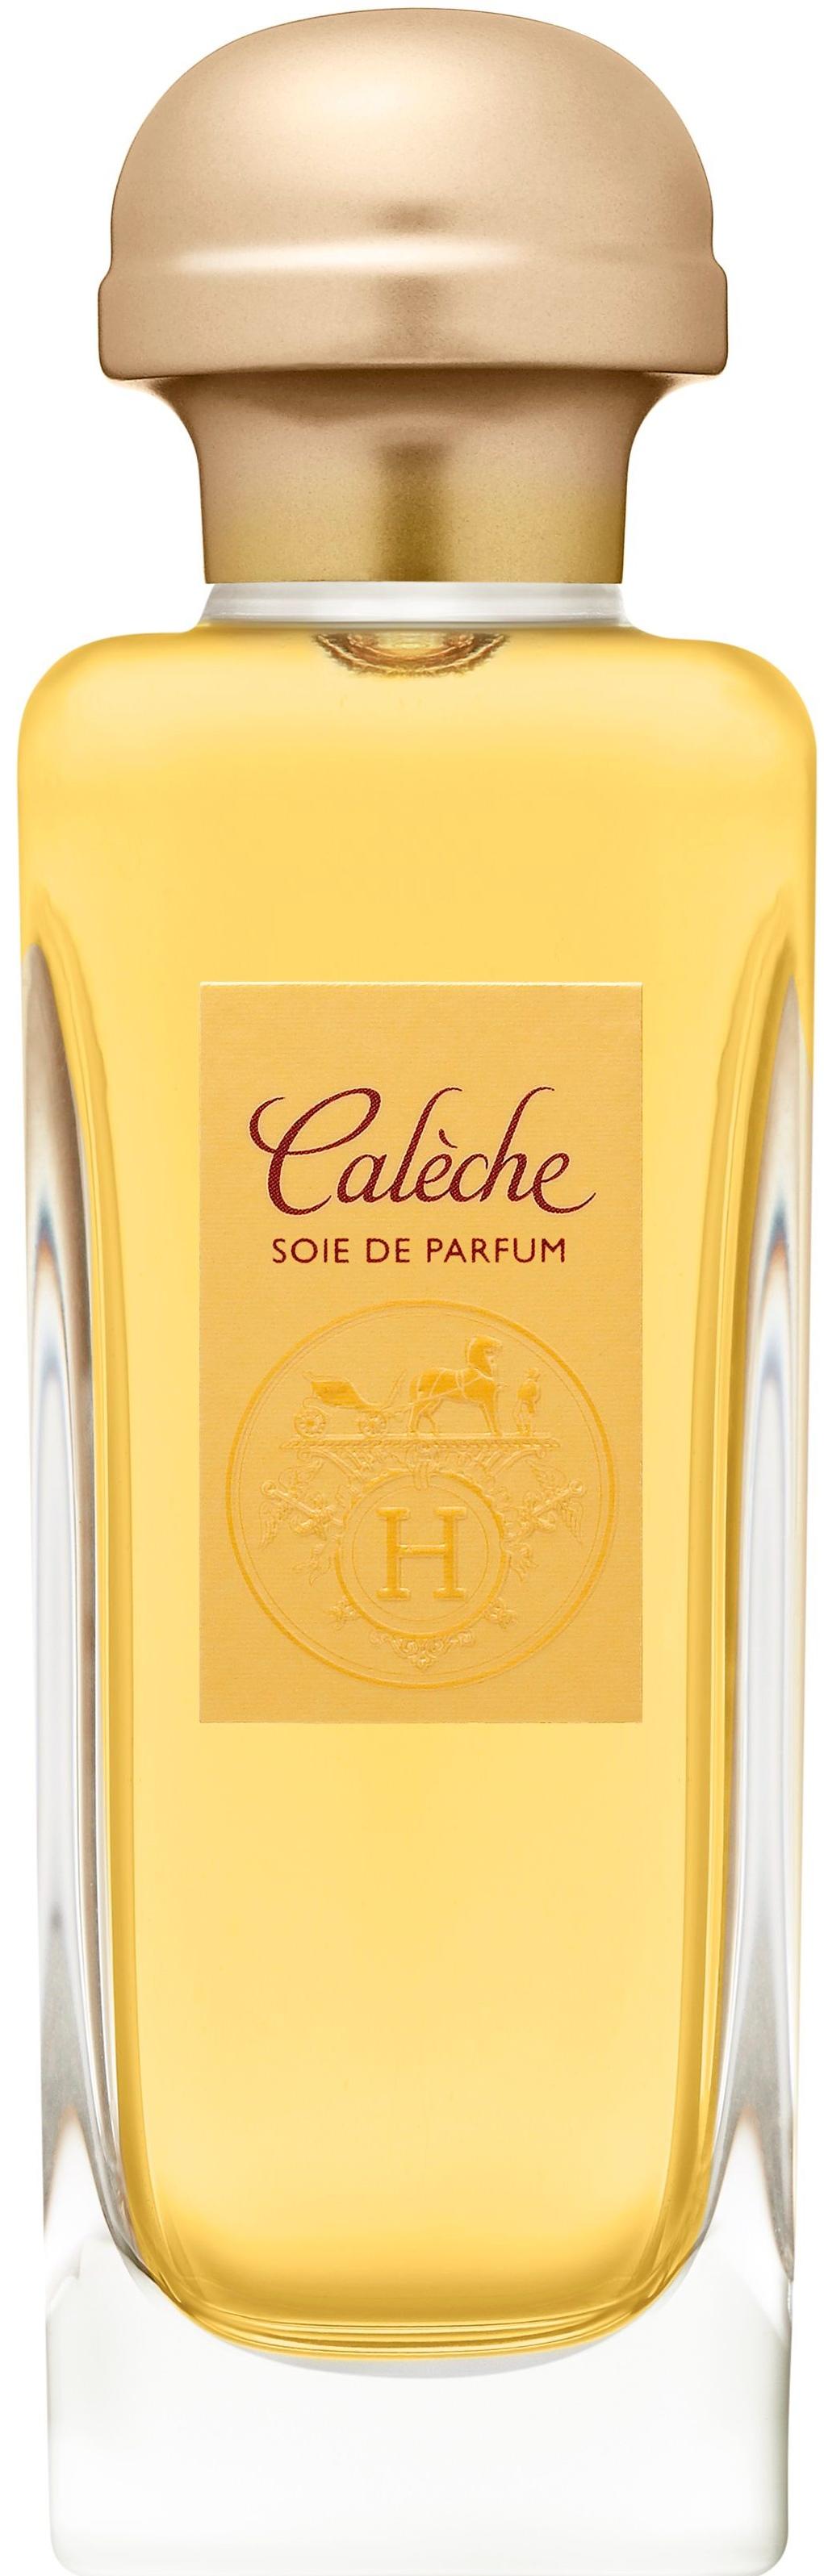 Hermes Caleche Soie de Parfum парфюмированная вода 100мл тестер (Гермес Калеш Шелковый Парфюм)